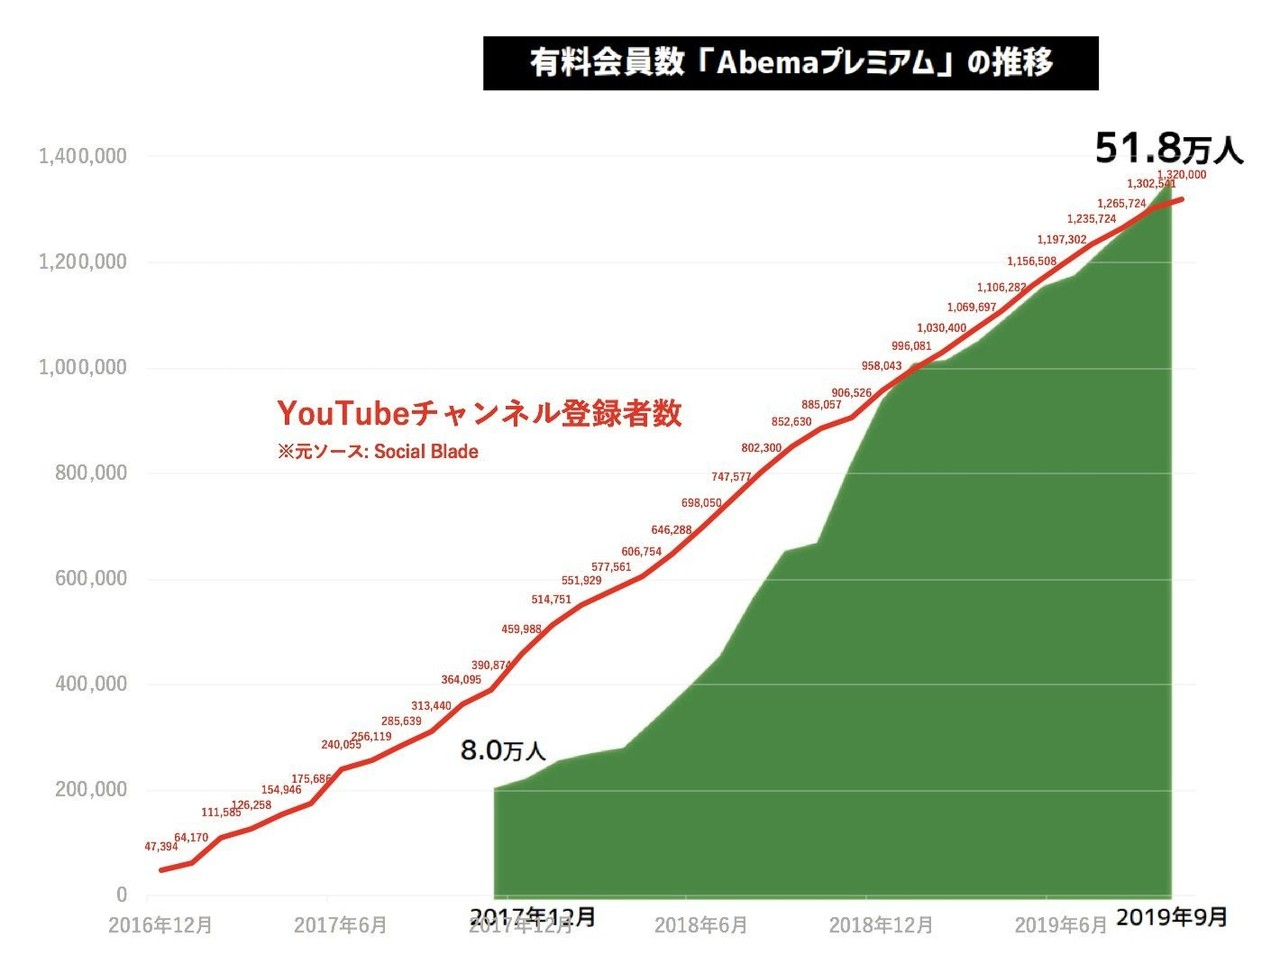 登録 数 Youtuber 推移 者